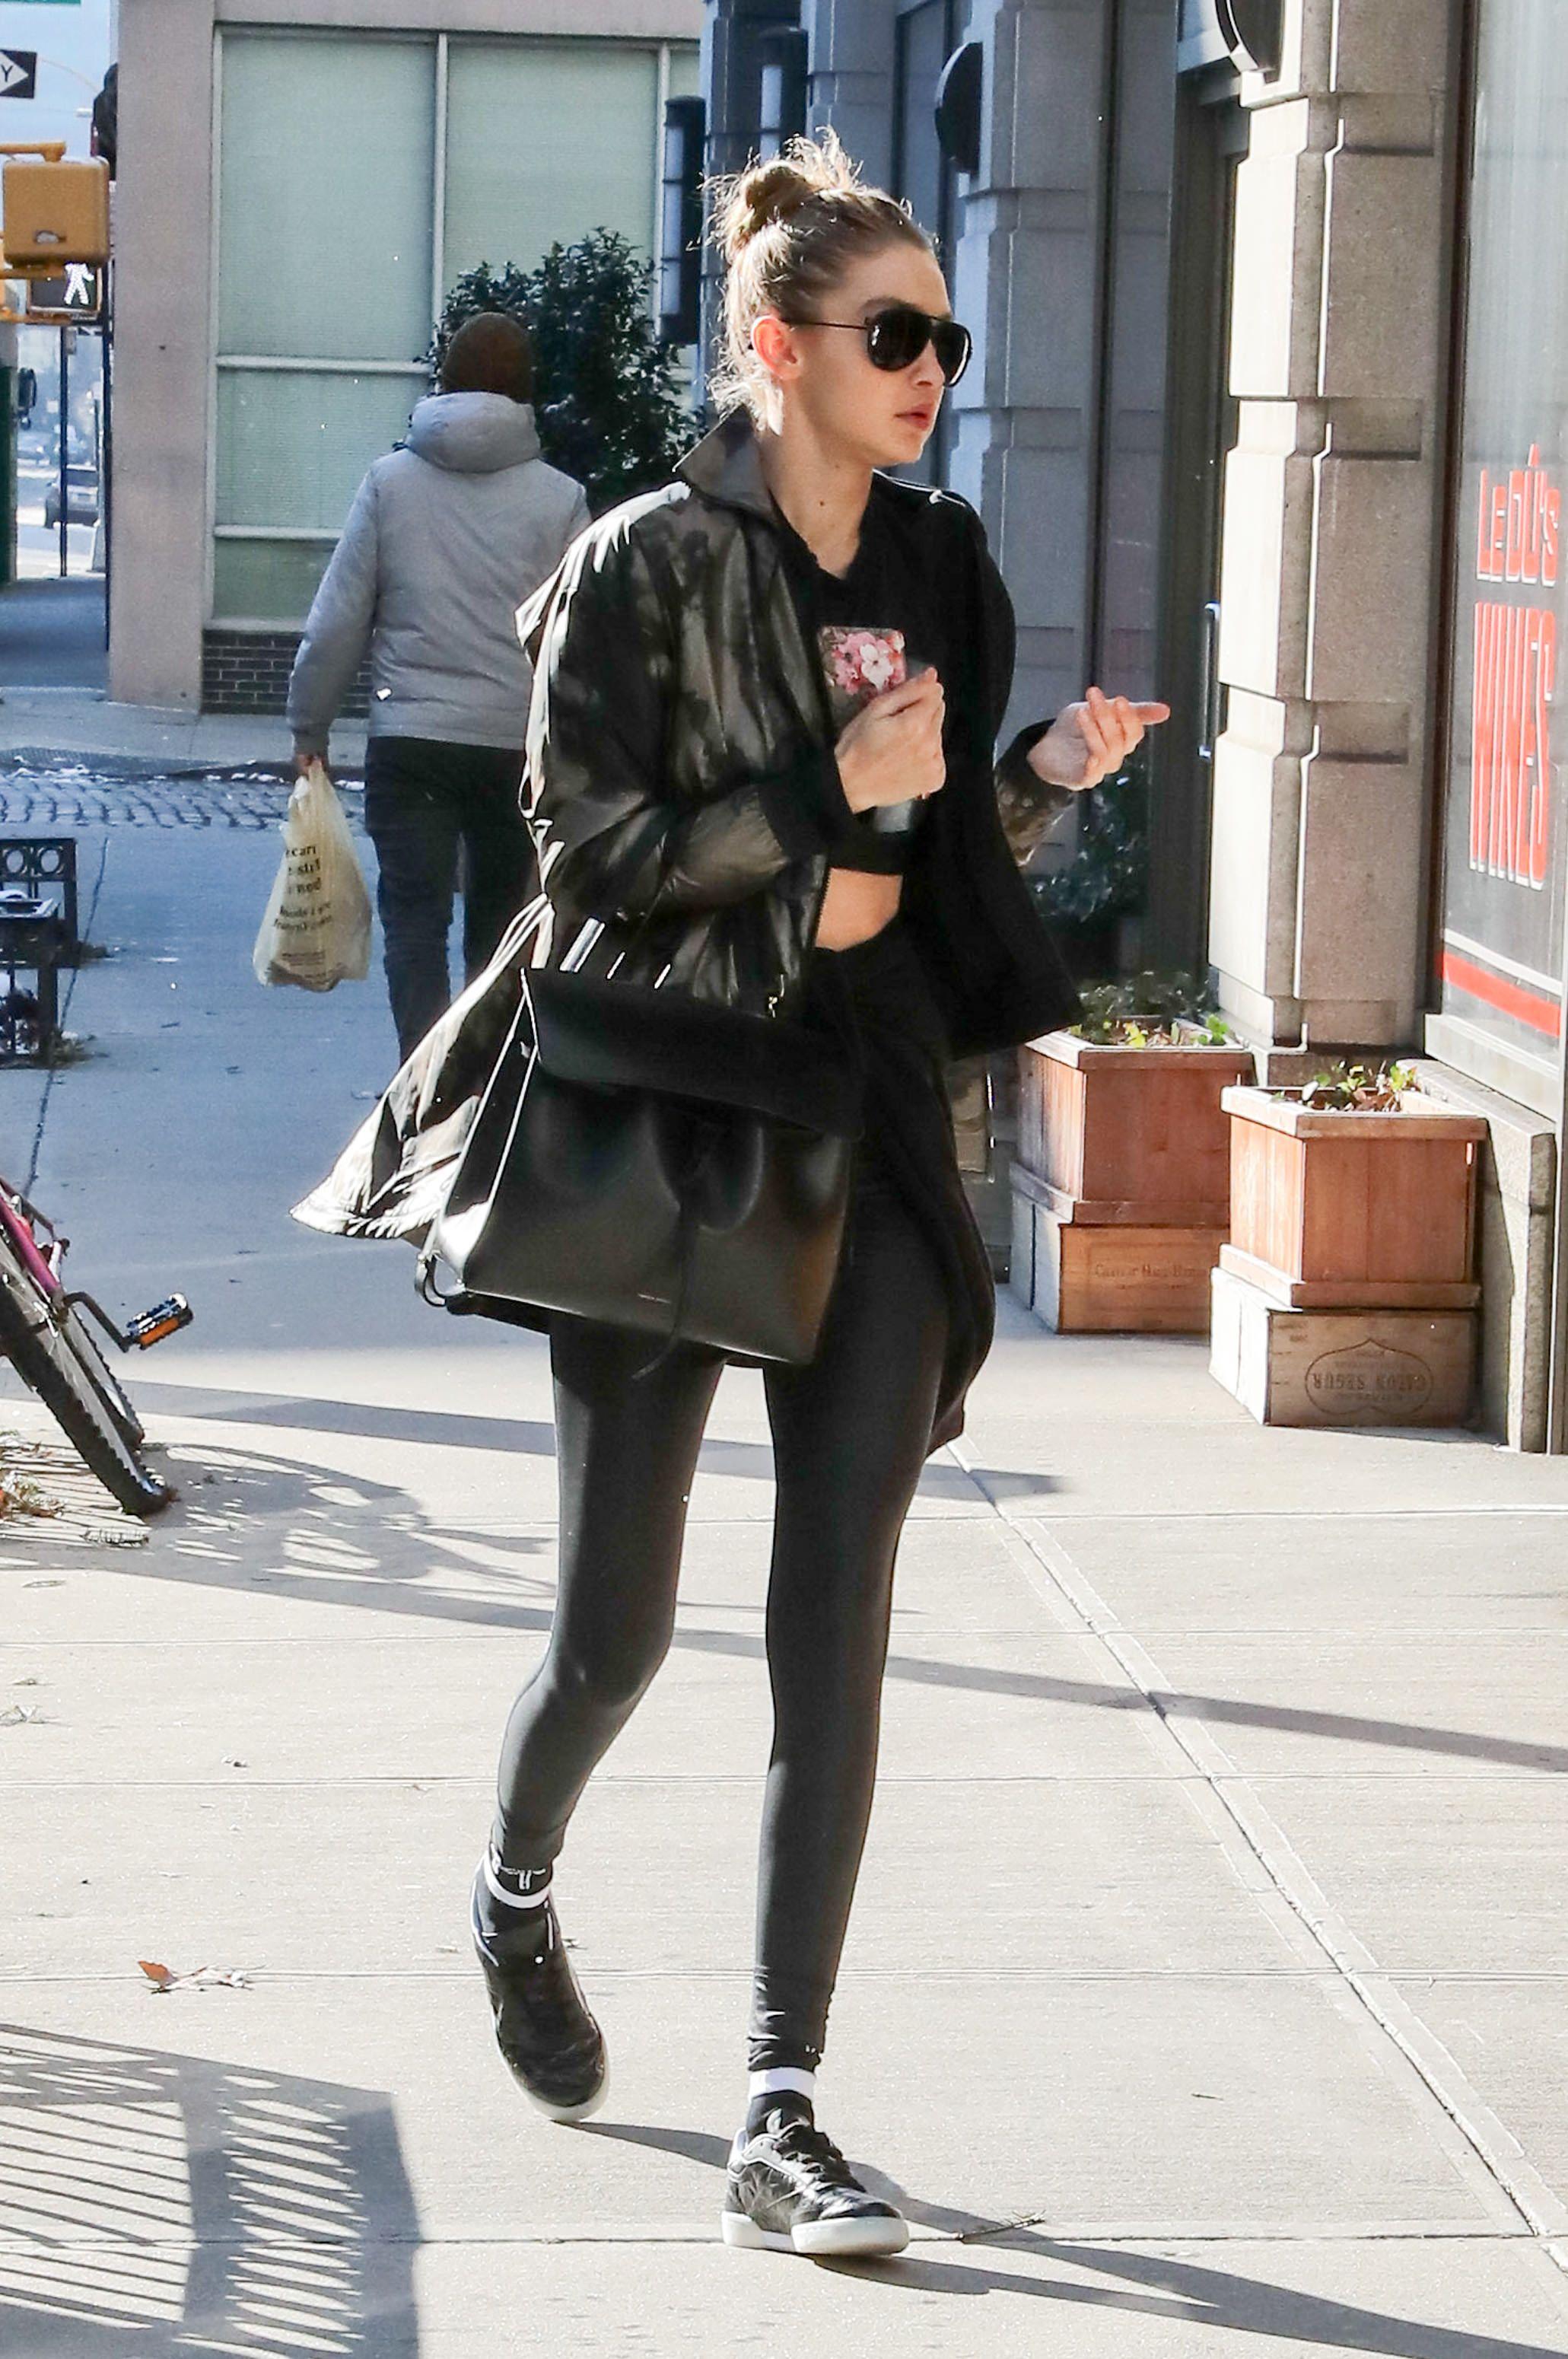 145f99436a Gigi Hadid Wears Giant White Coat to Dinner in NYC - Gigi Hadid Fashion  Photos